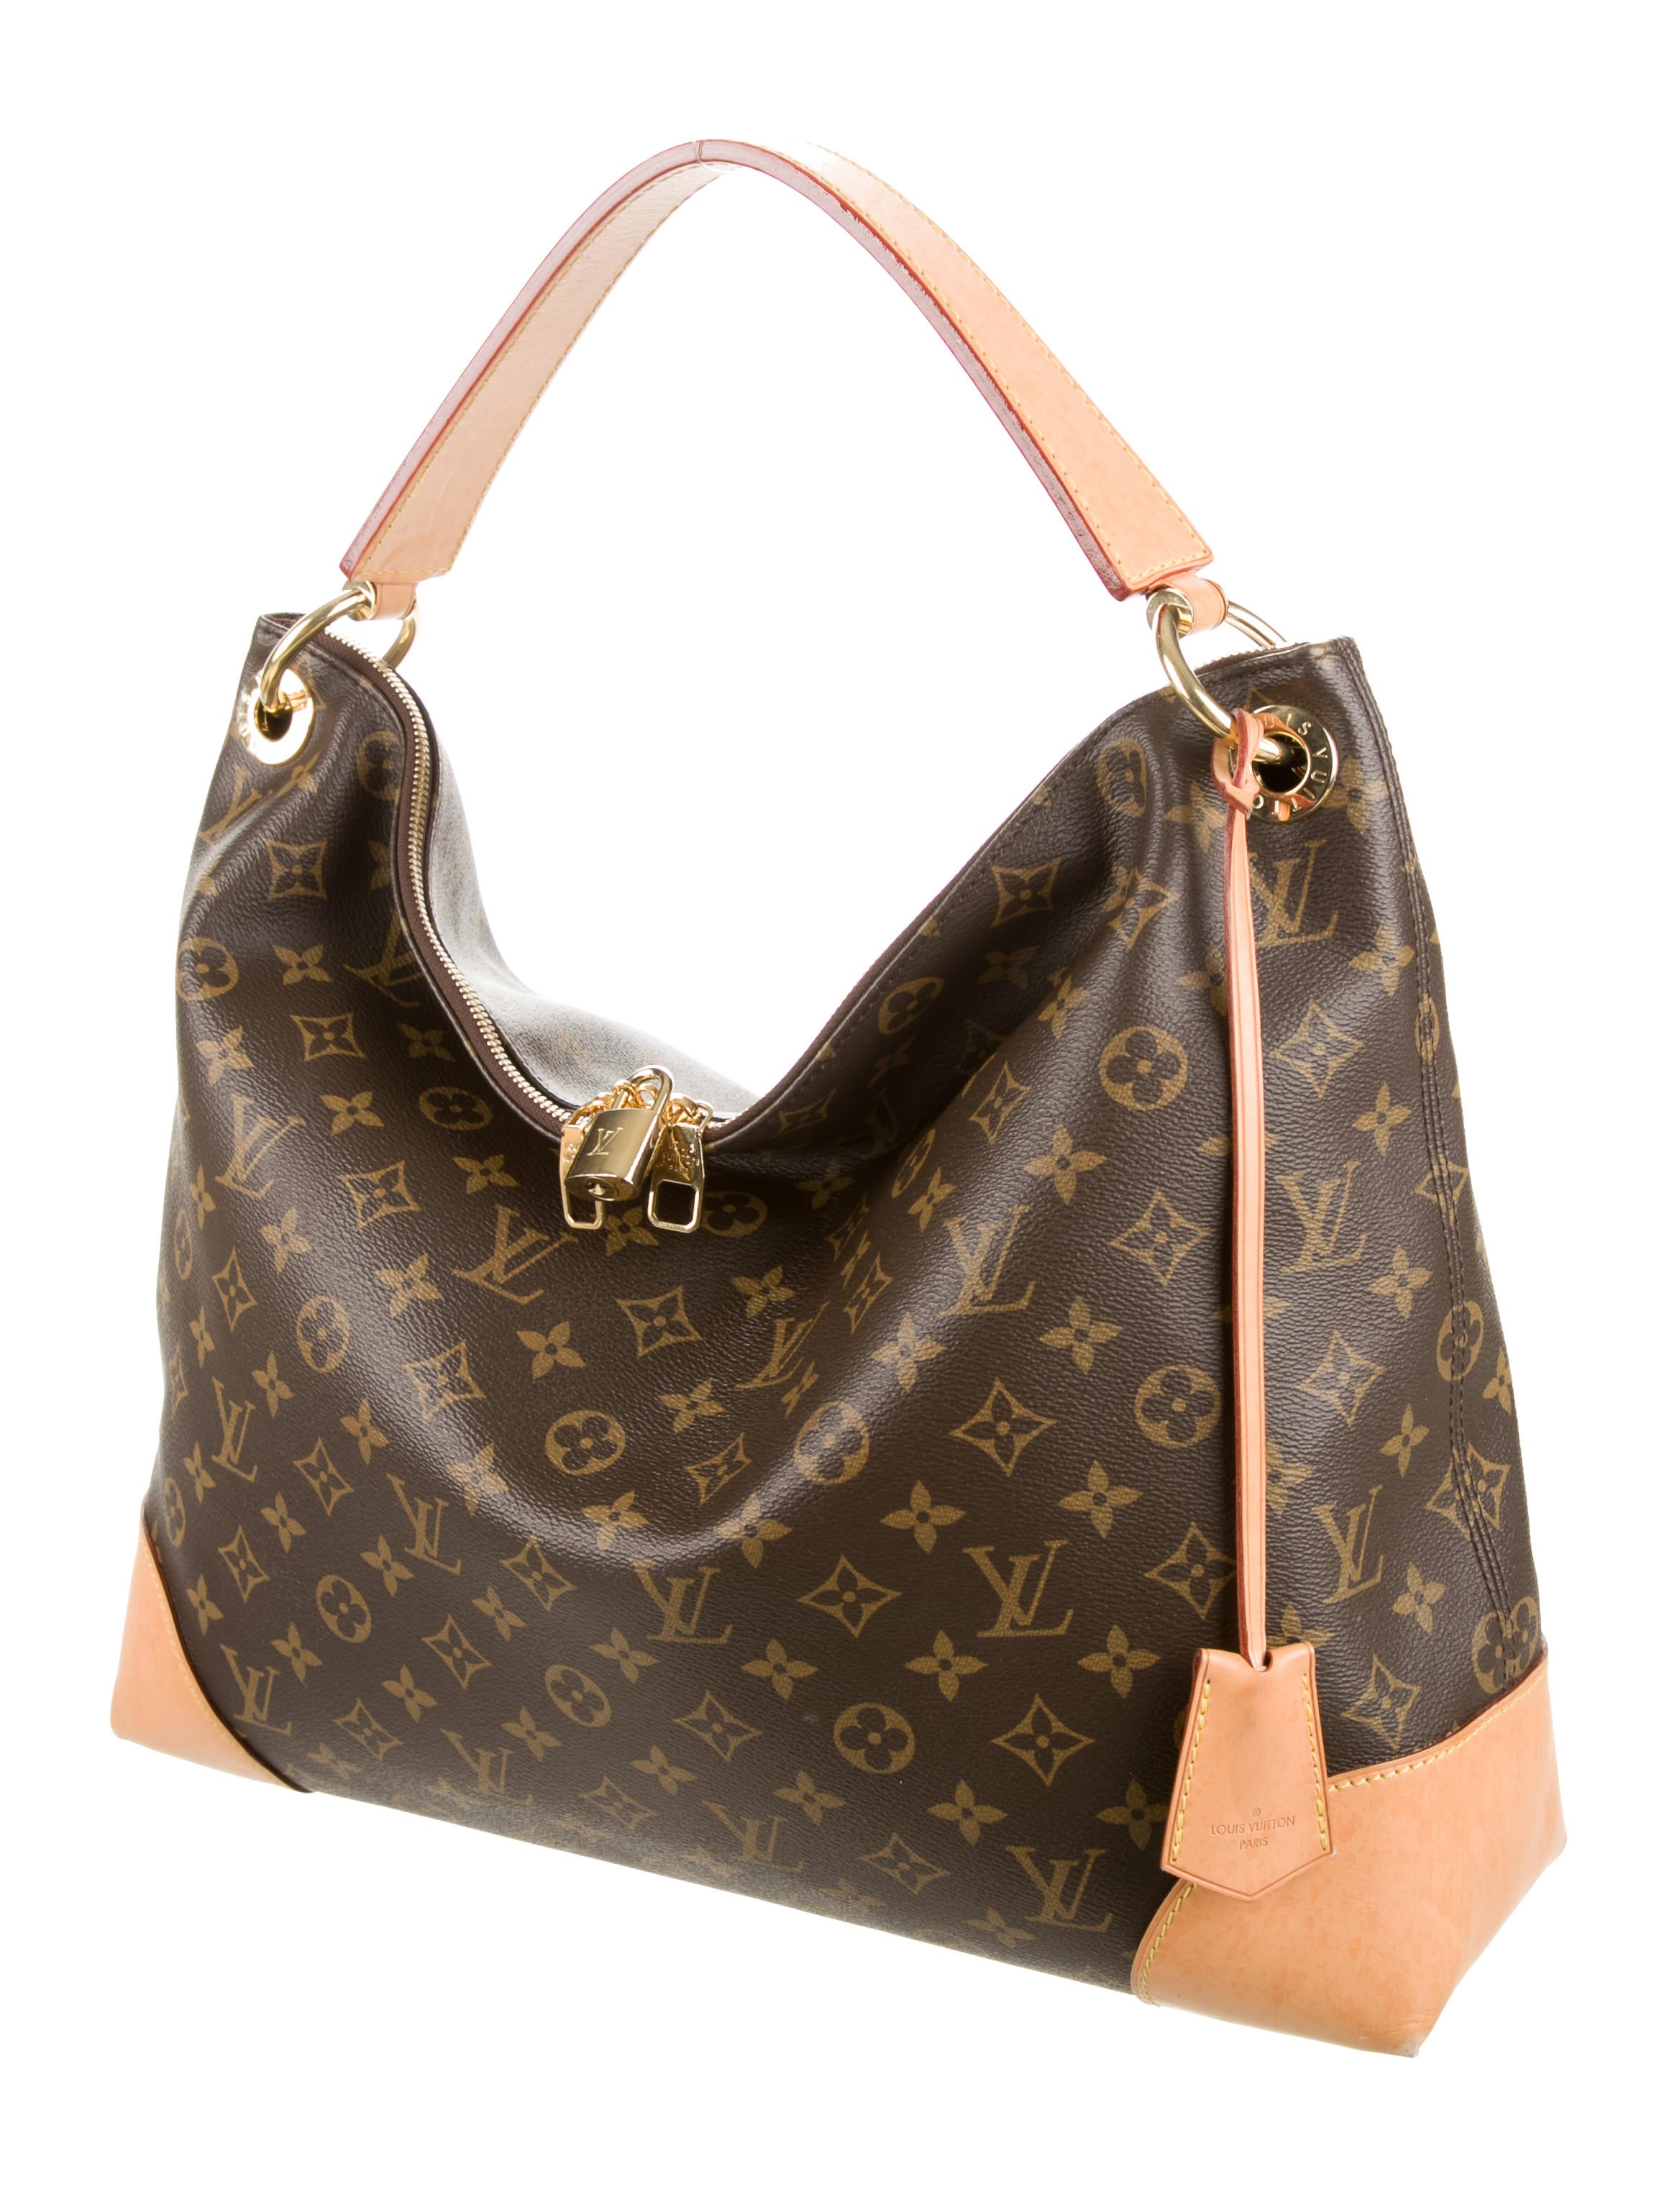 Louis Vuitton 2016 Monogram Berri MM Handbags  : LOU1047113enlarged from www.therealreal.com size 2332 x 3076 jpeg 546kB